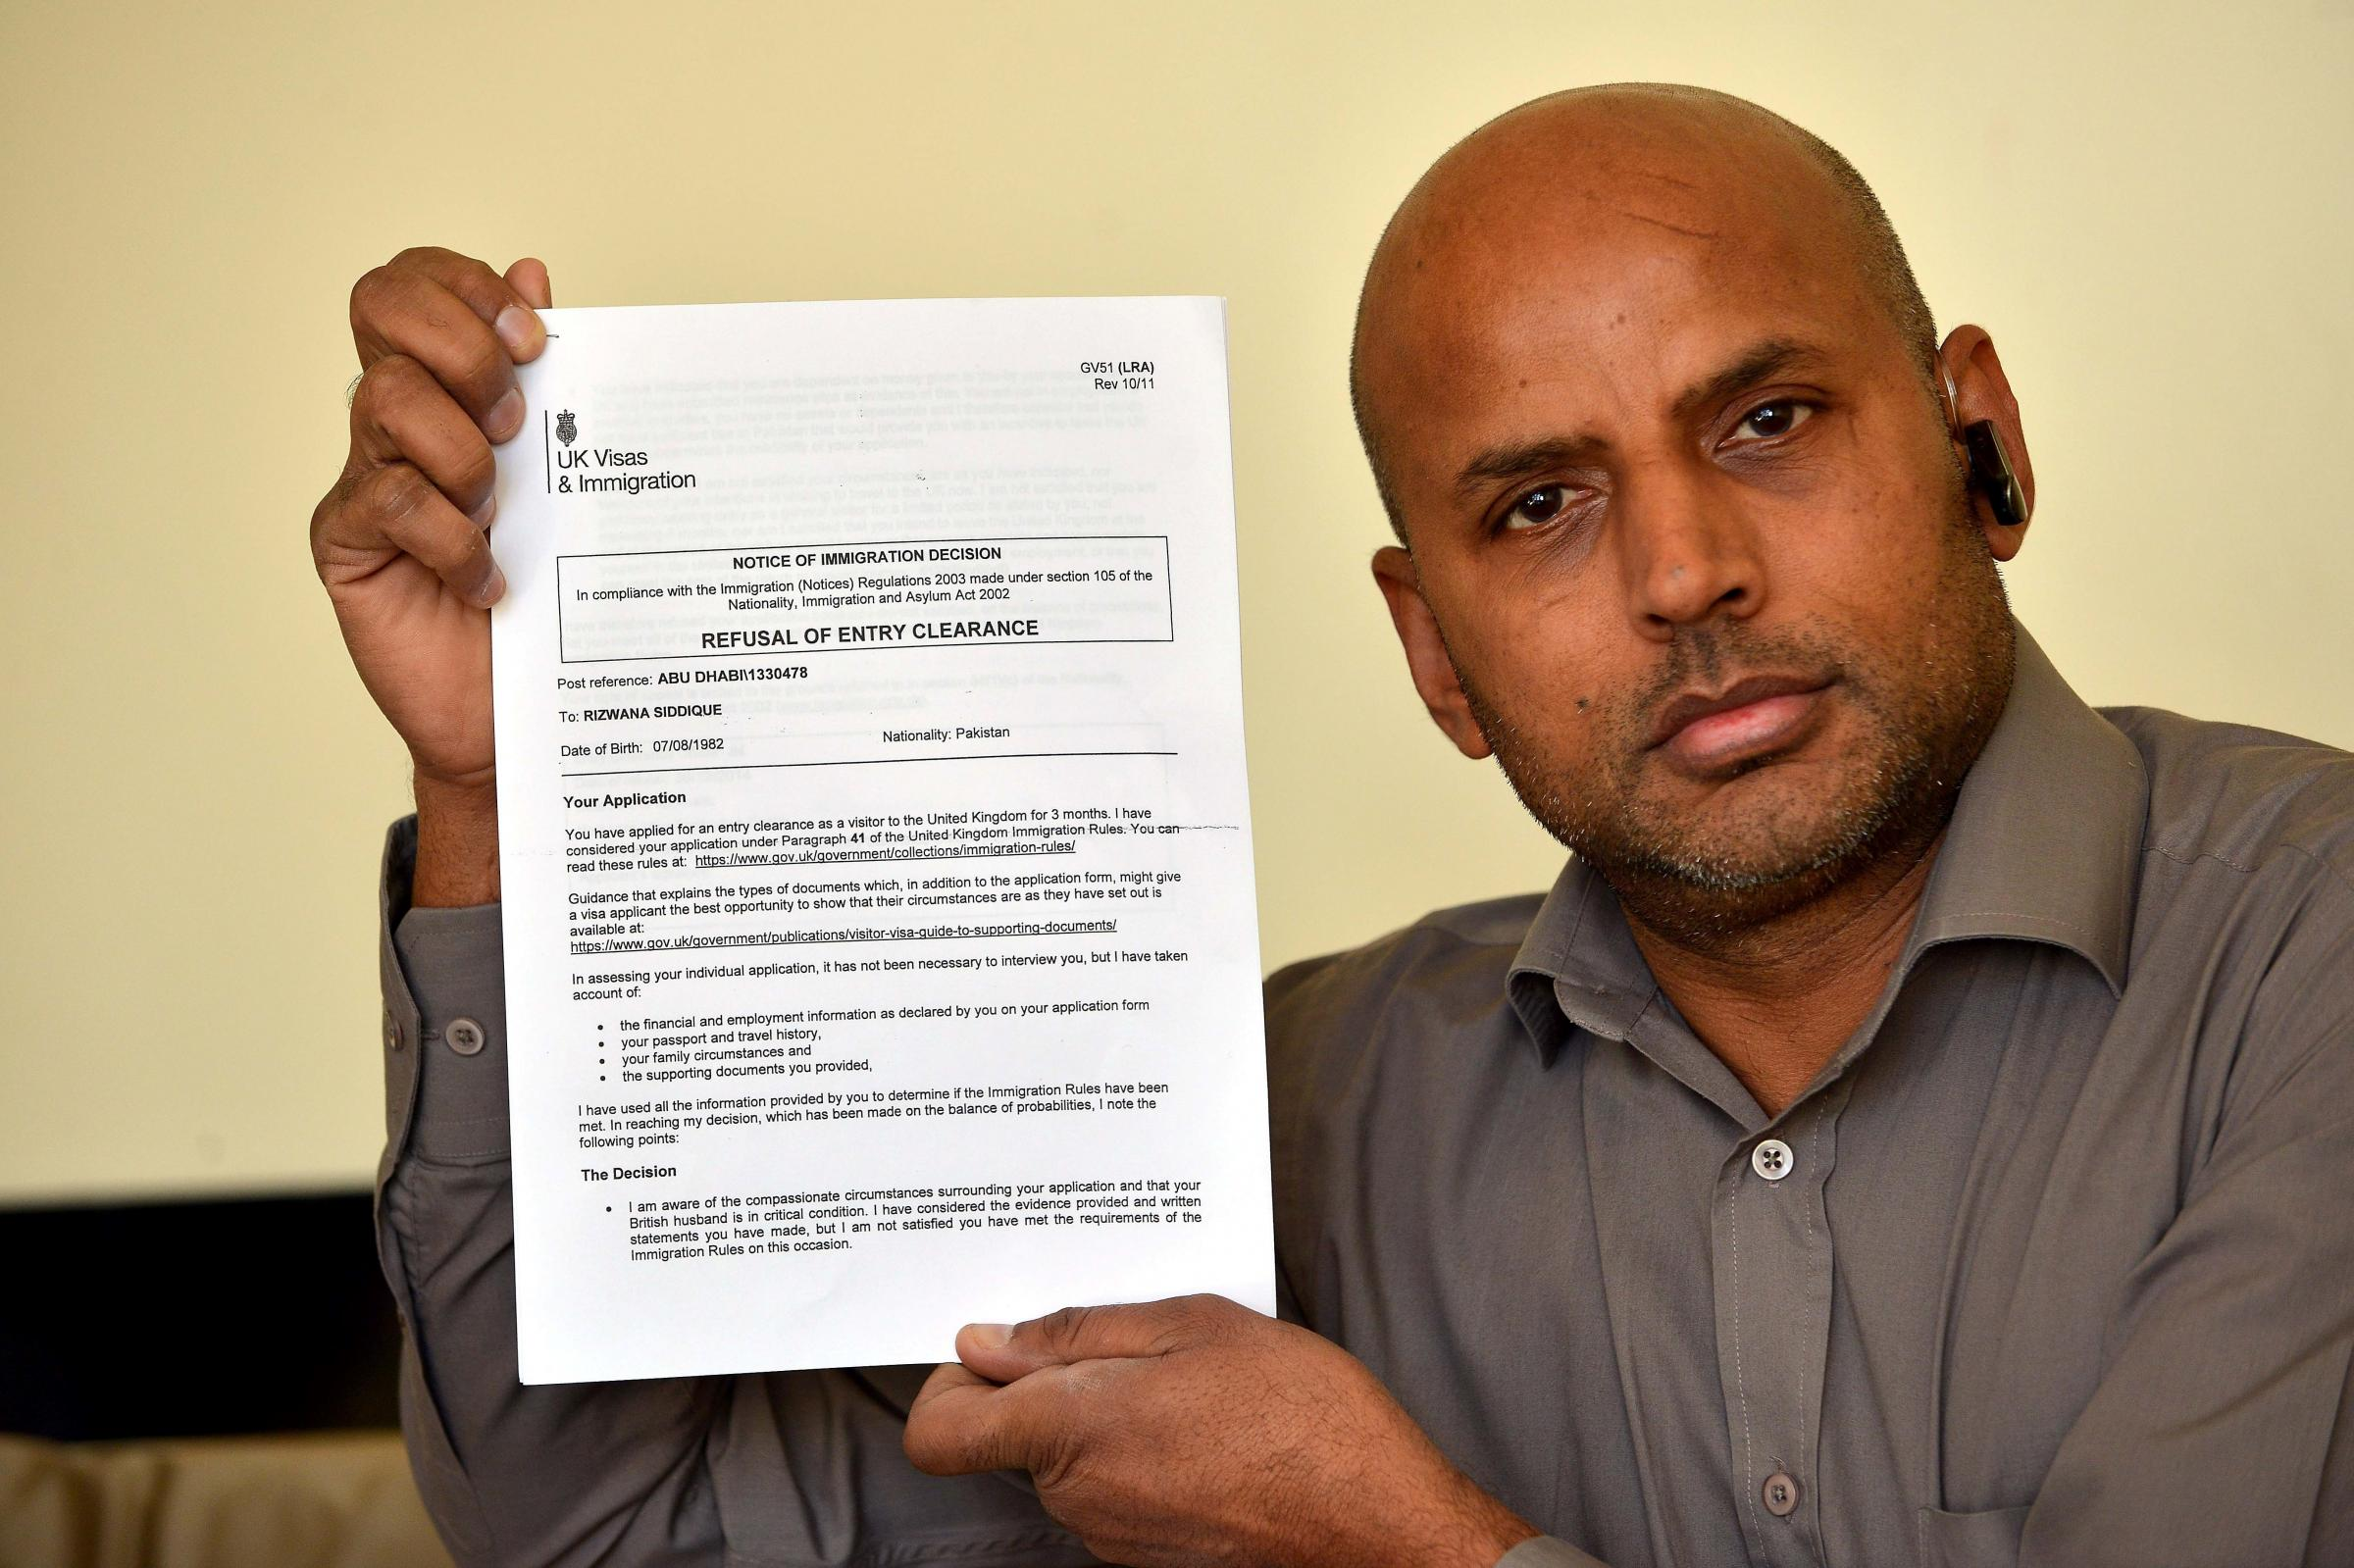 Mohammed Ramzan, uncle of Haq Nawaz Rasool, holds aloft a letter refusing Haq's wife - 3519358